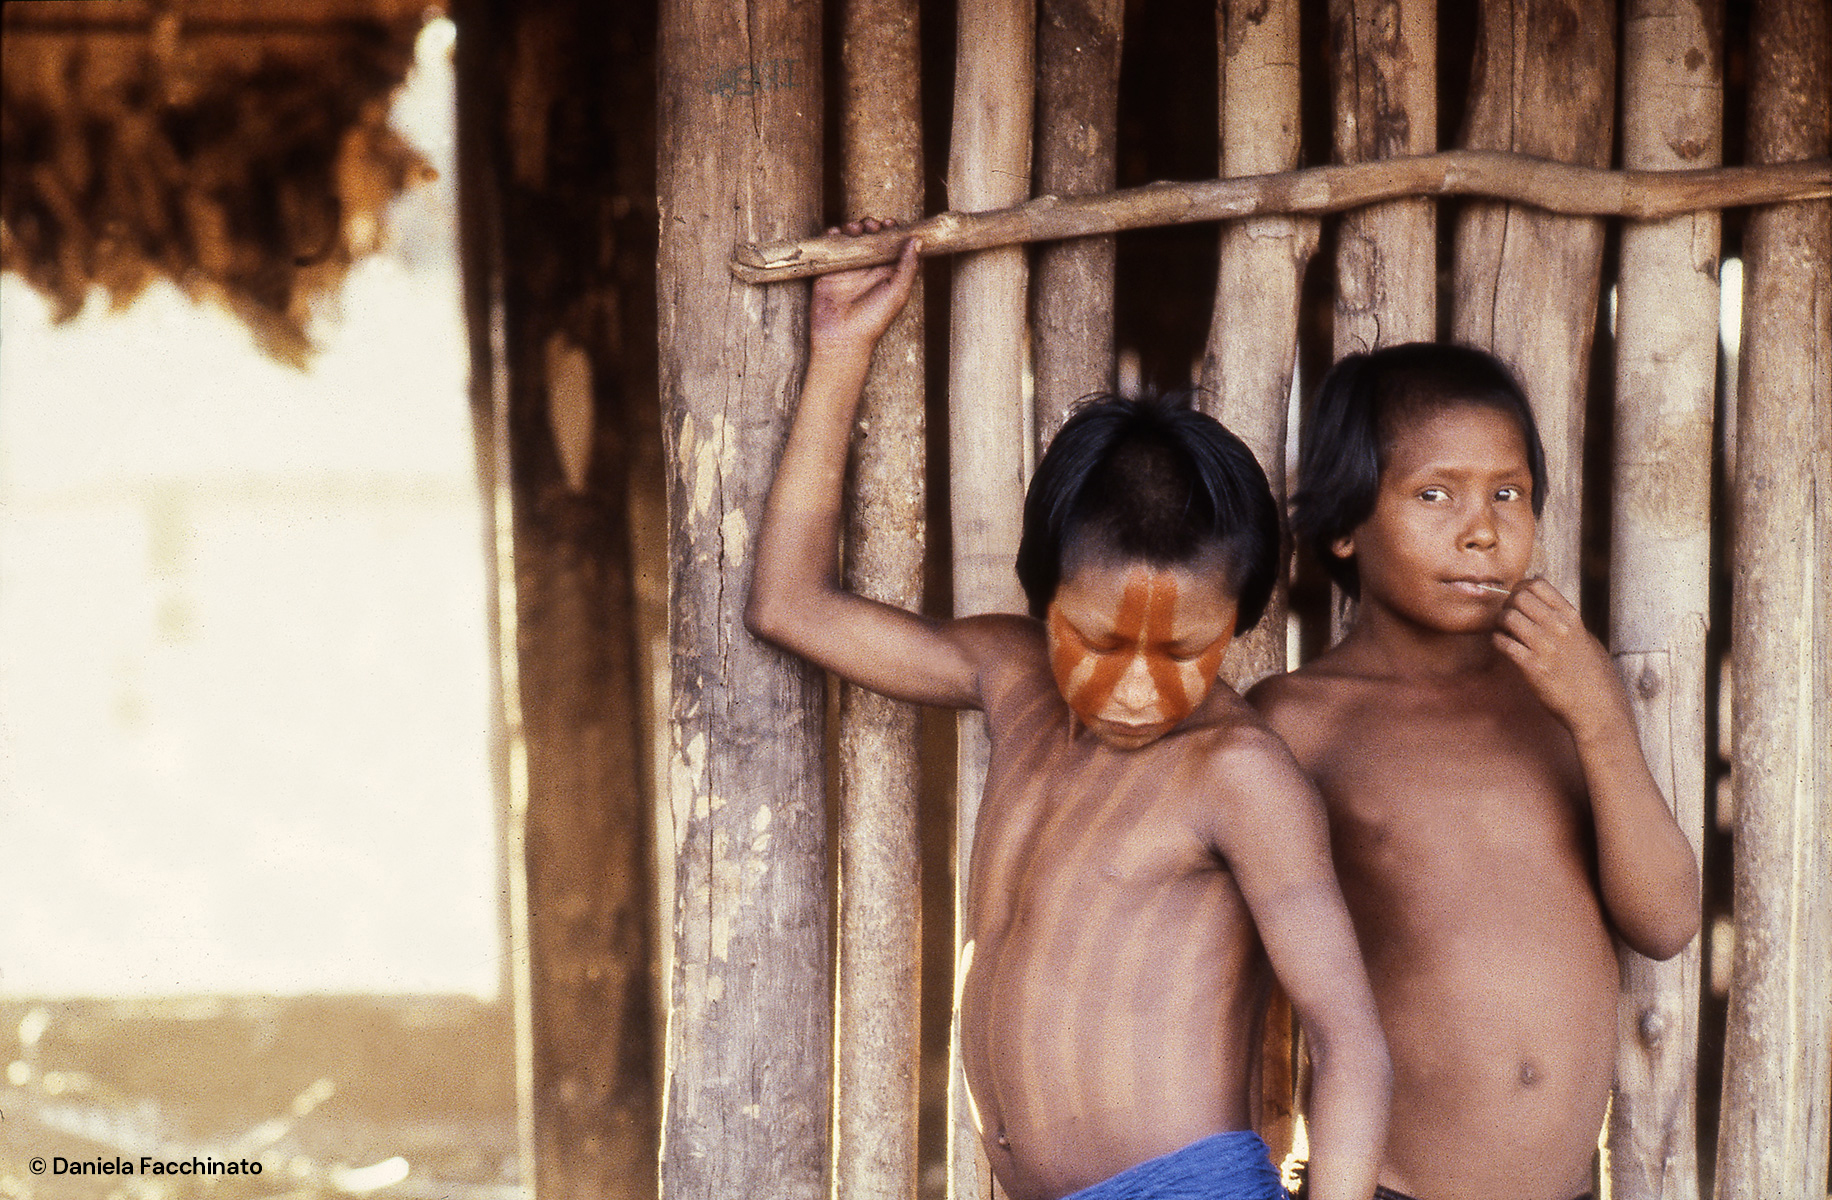 Amazonia, Xingù. Young Kayapò indios